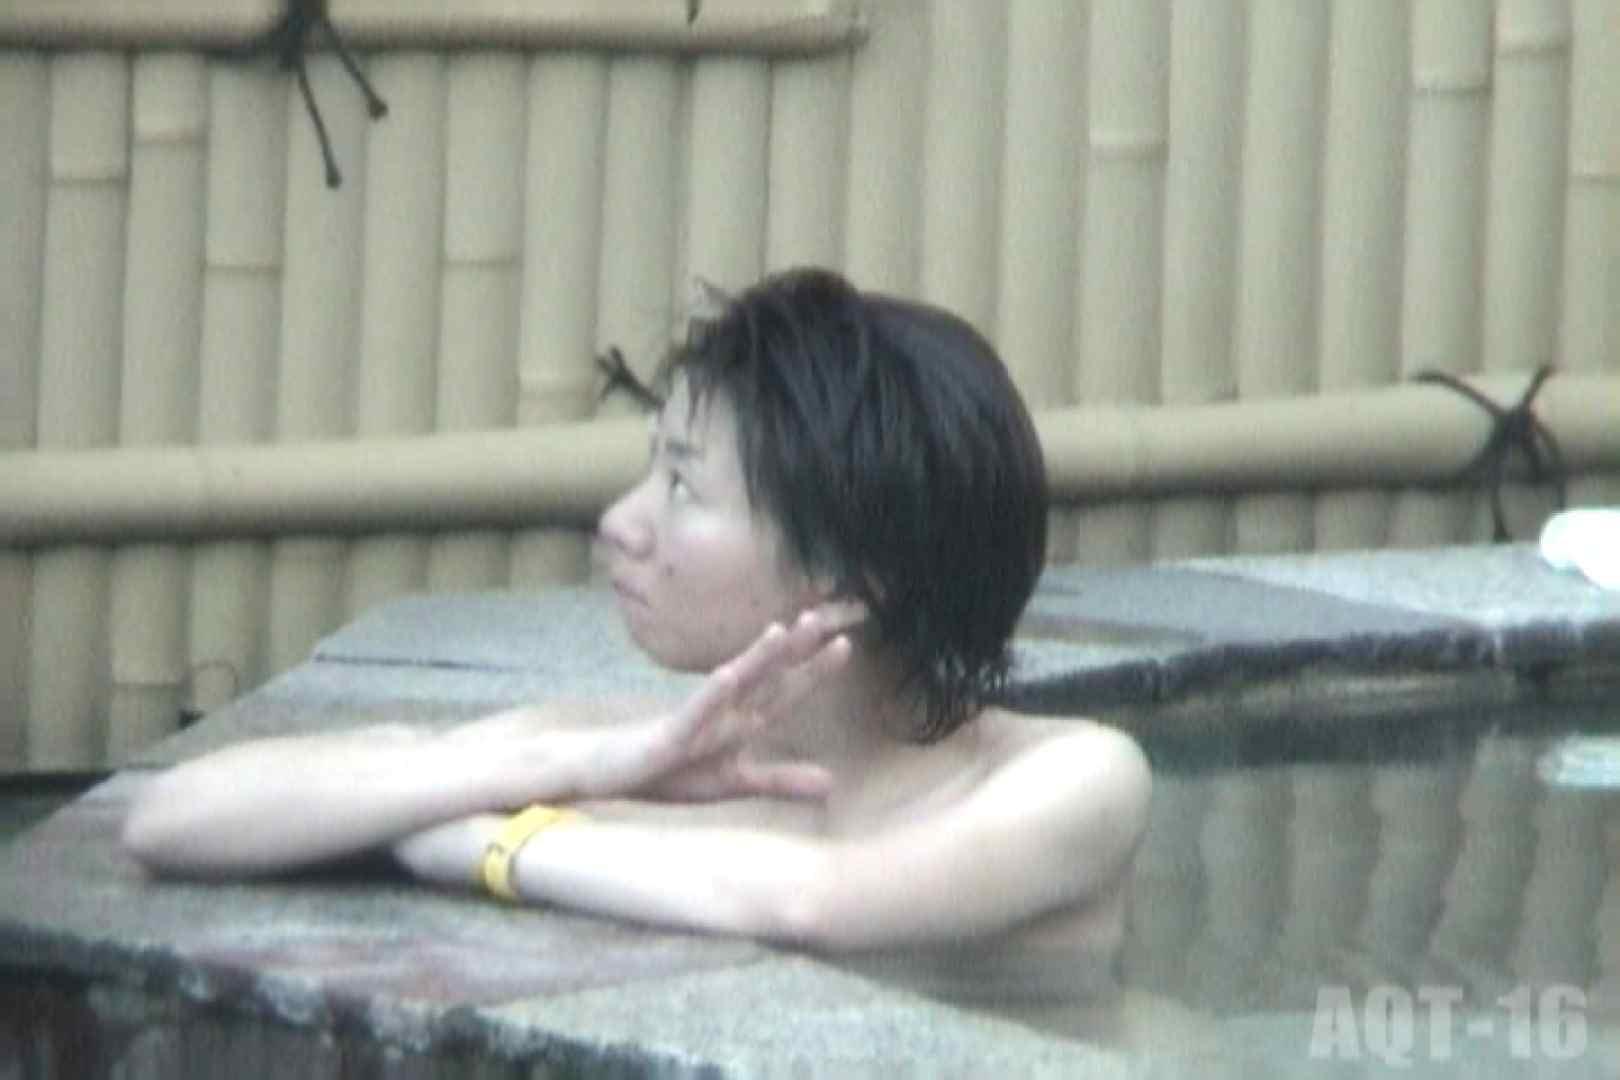 Aquaな露天風呂Vol.842 盗撮  44連発 6